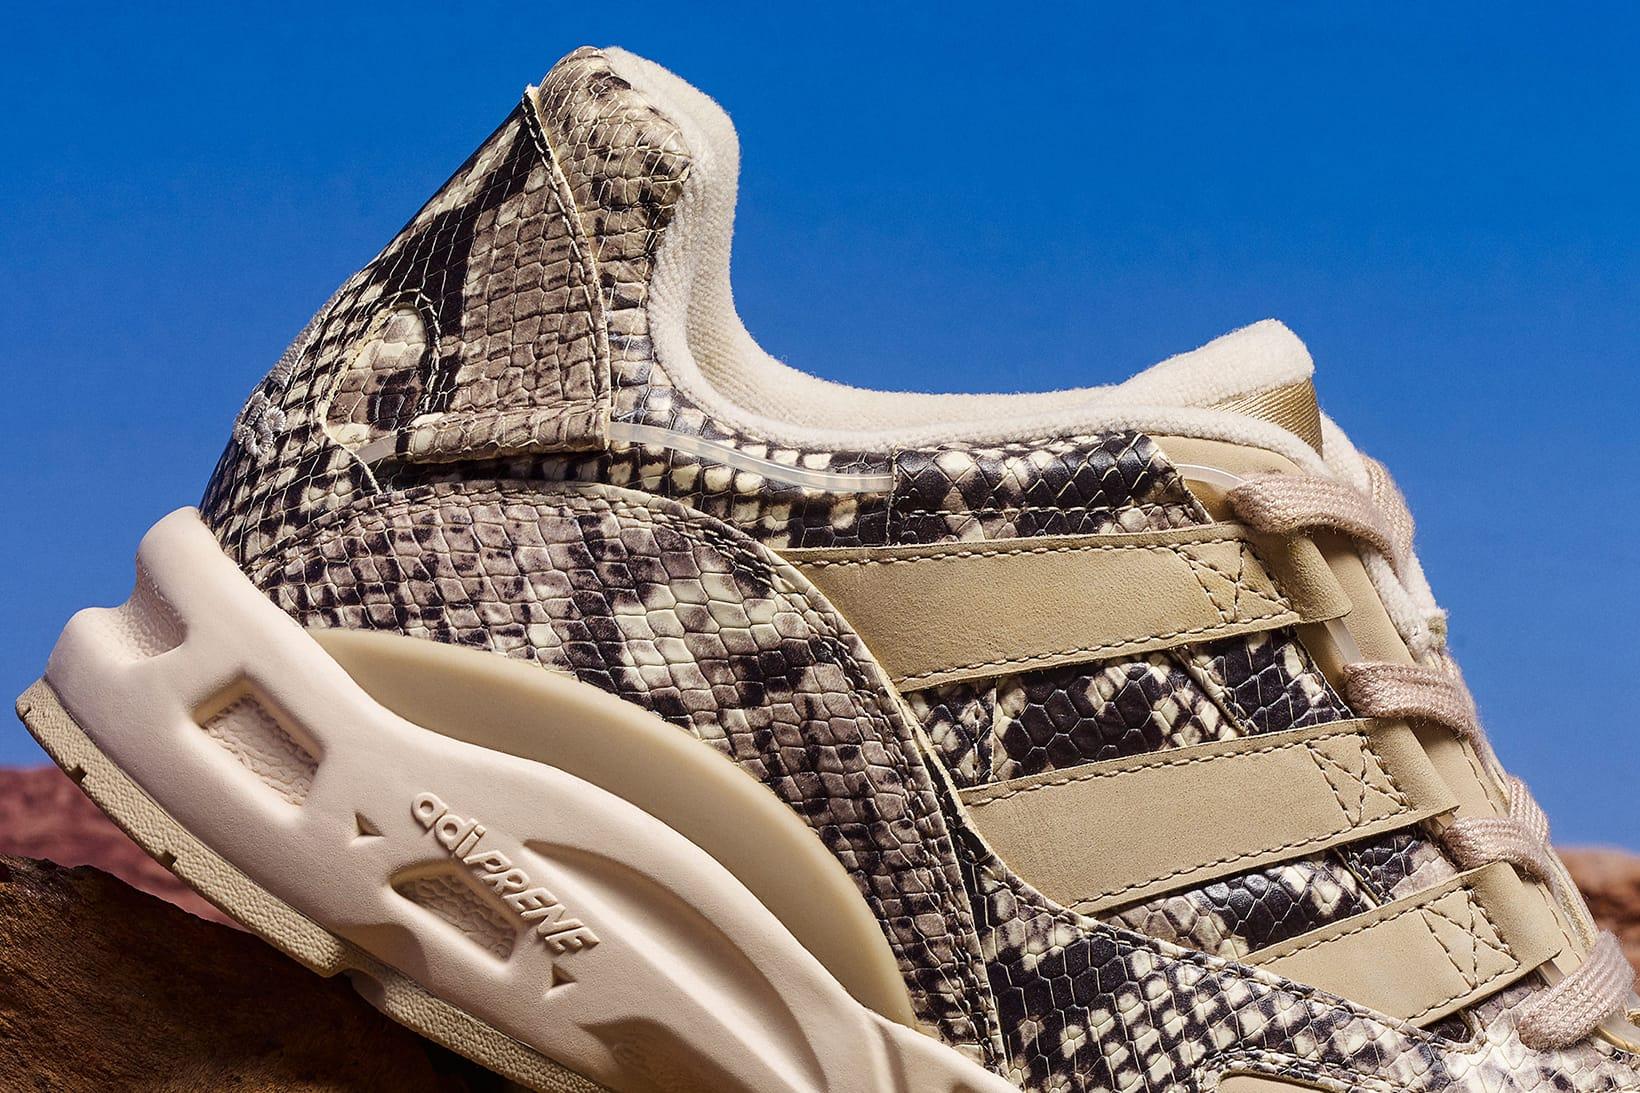 adidas Originals Snakeskin Pack Release